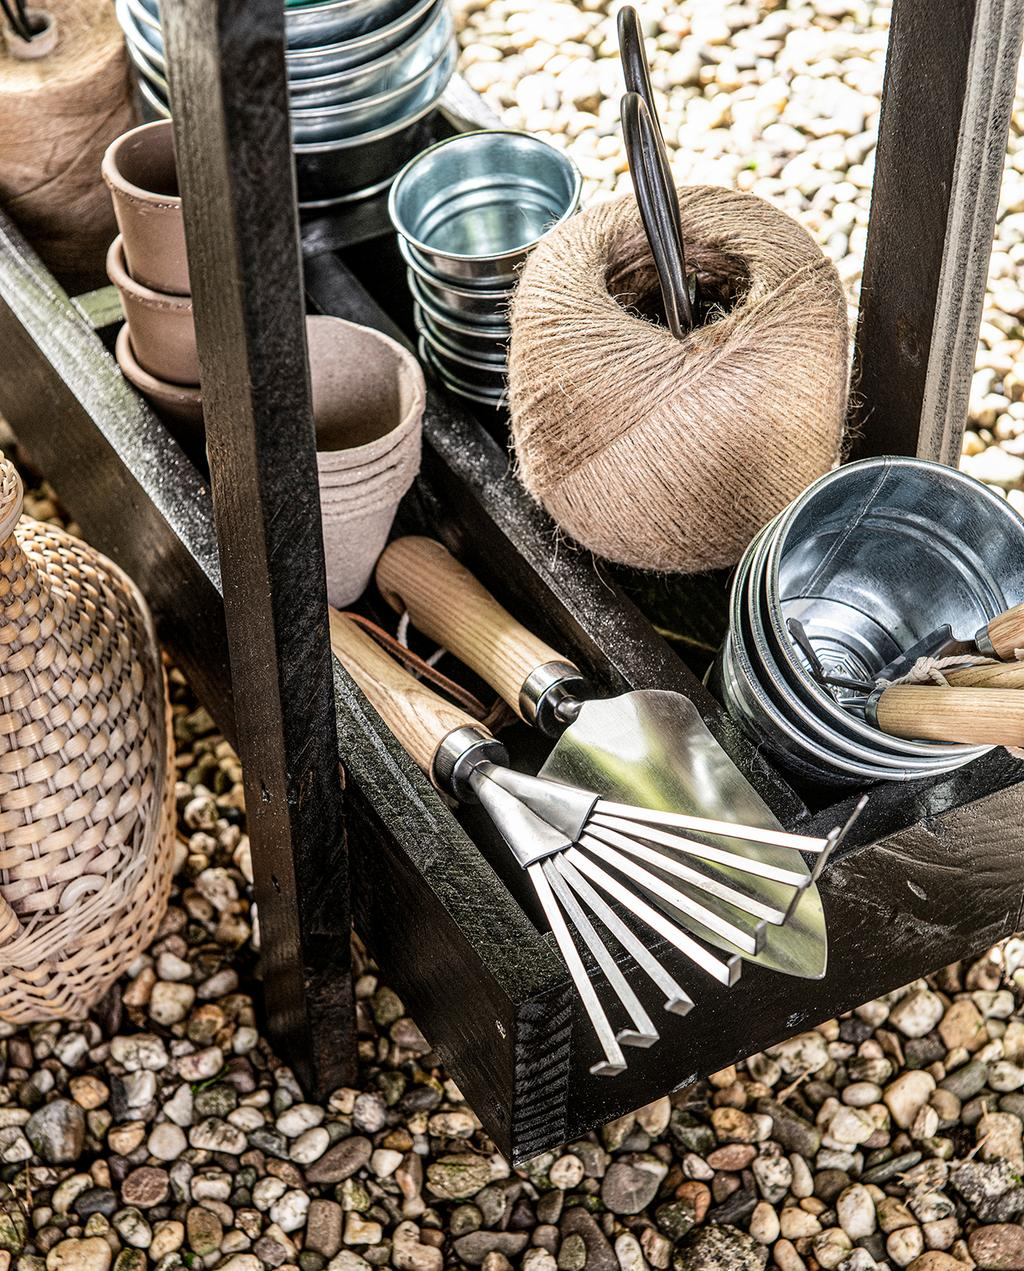 vtwonen tuin special 1 2020 |  tuin gereedschap in houten kruidenbak